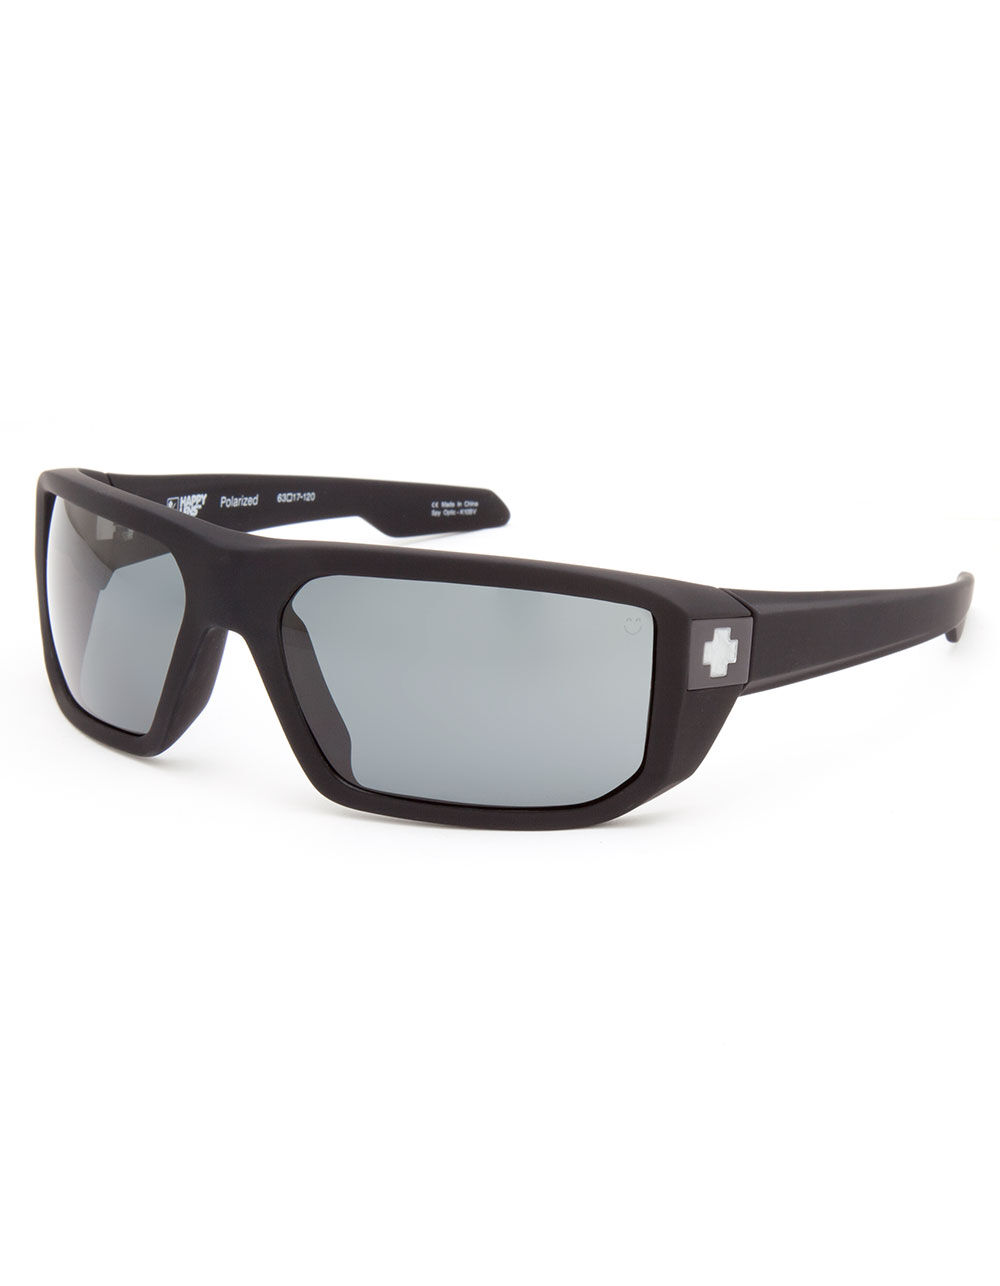 SPY Happy Lens McCoy Polarized Sunglasses